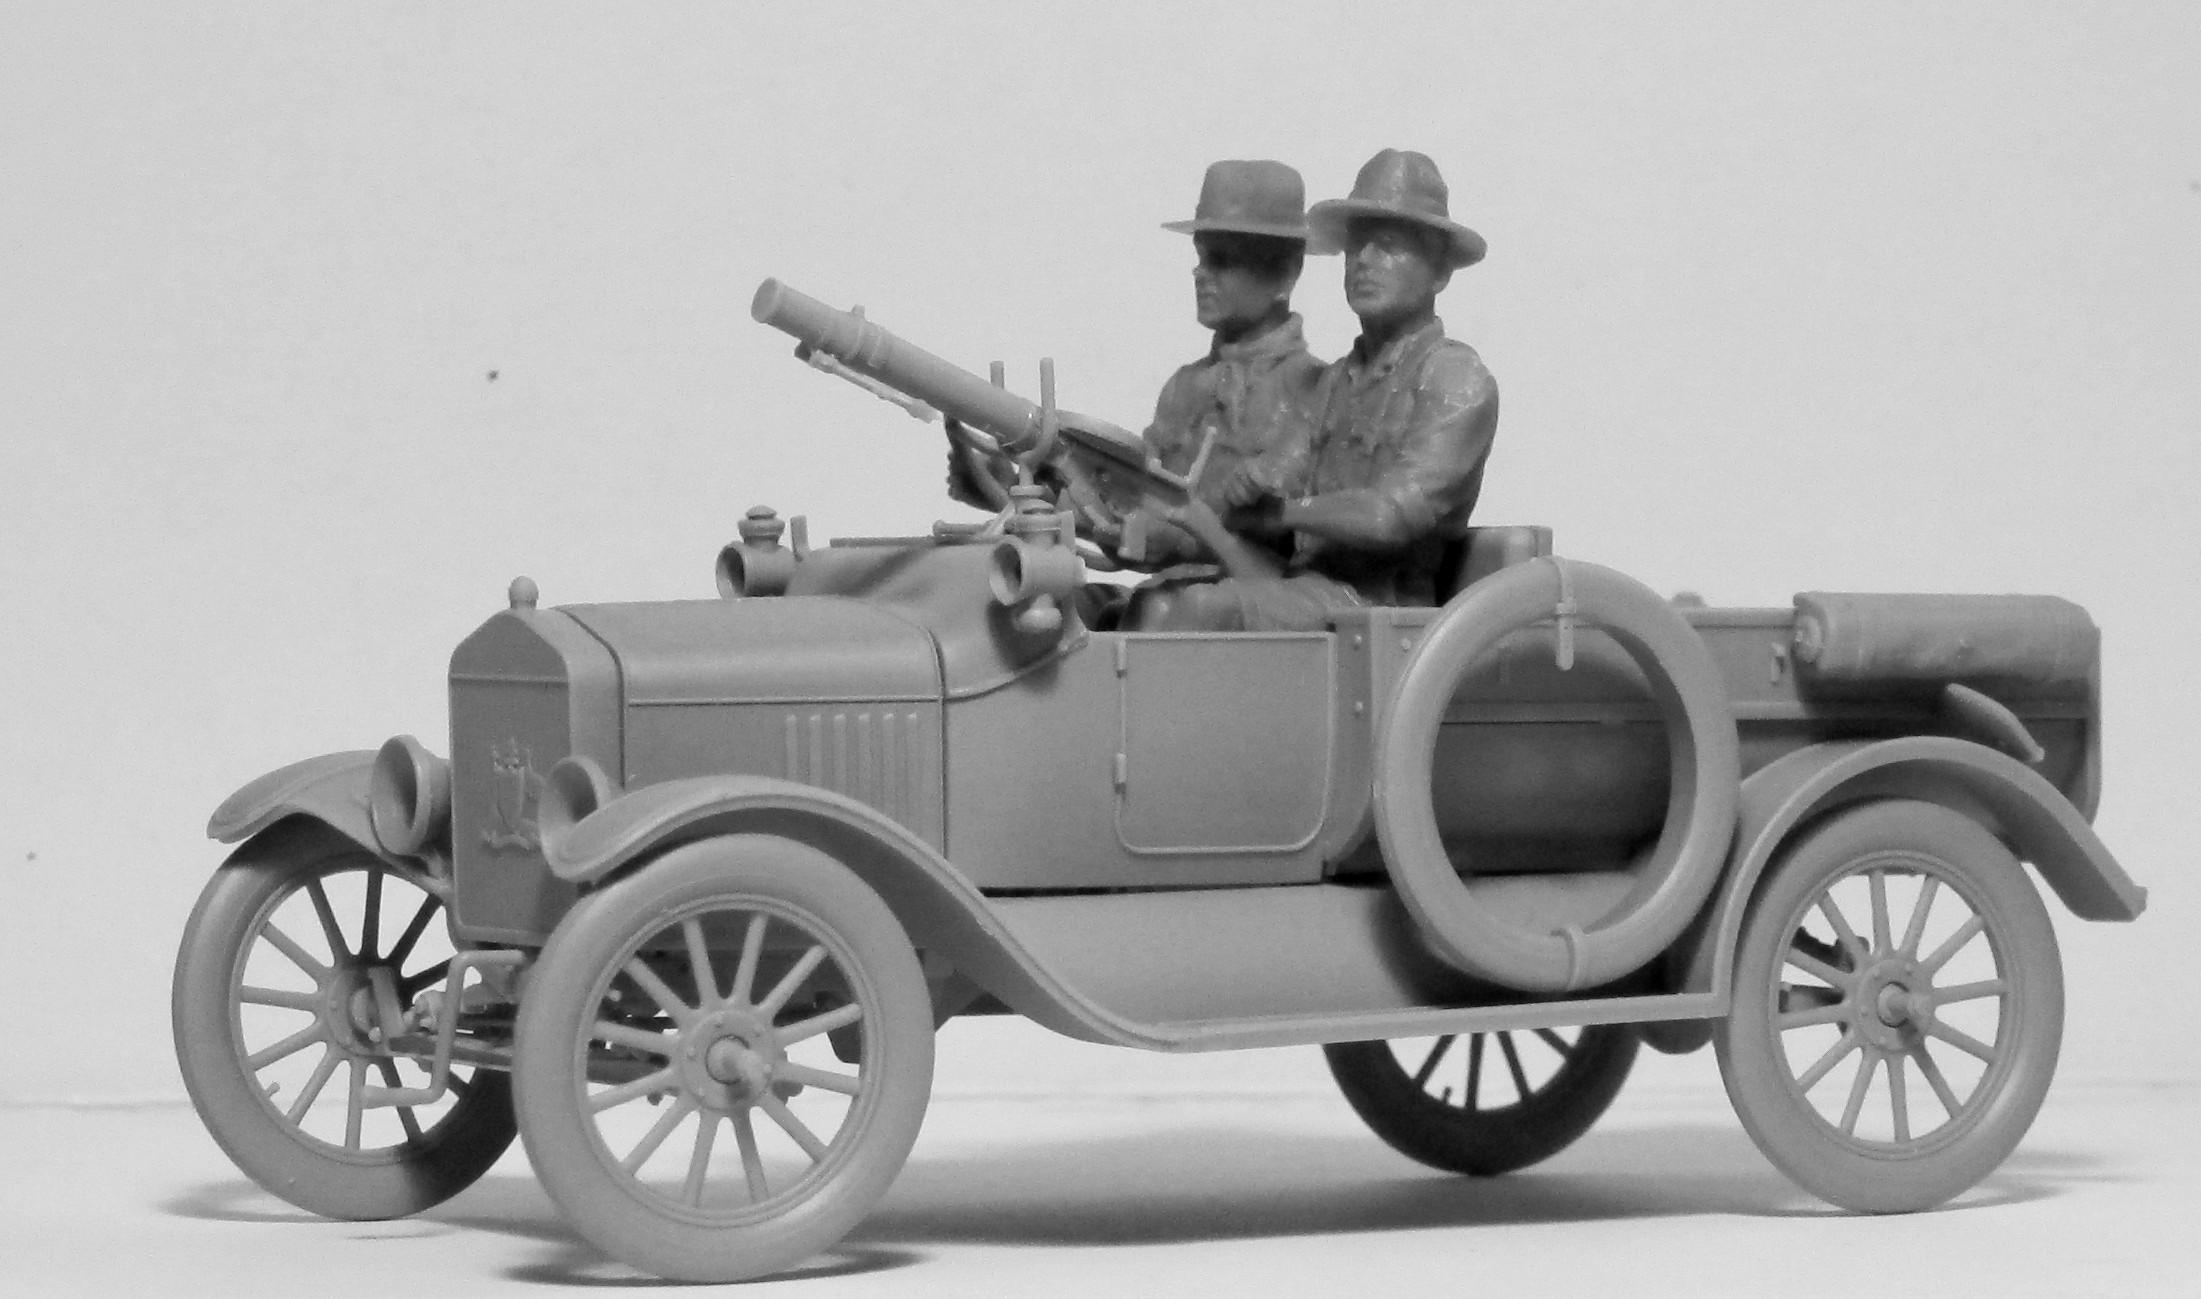 1/35 Водители АНЗАК (1917-1918 г.) #35707 / ANZAC Drivers (1917-1918) (2 figures) (100% new molds)